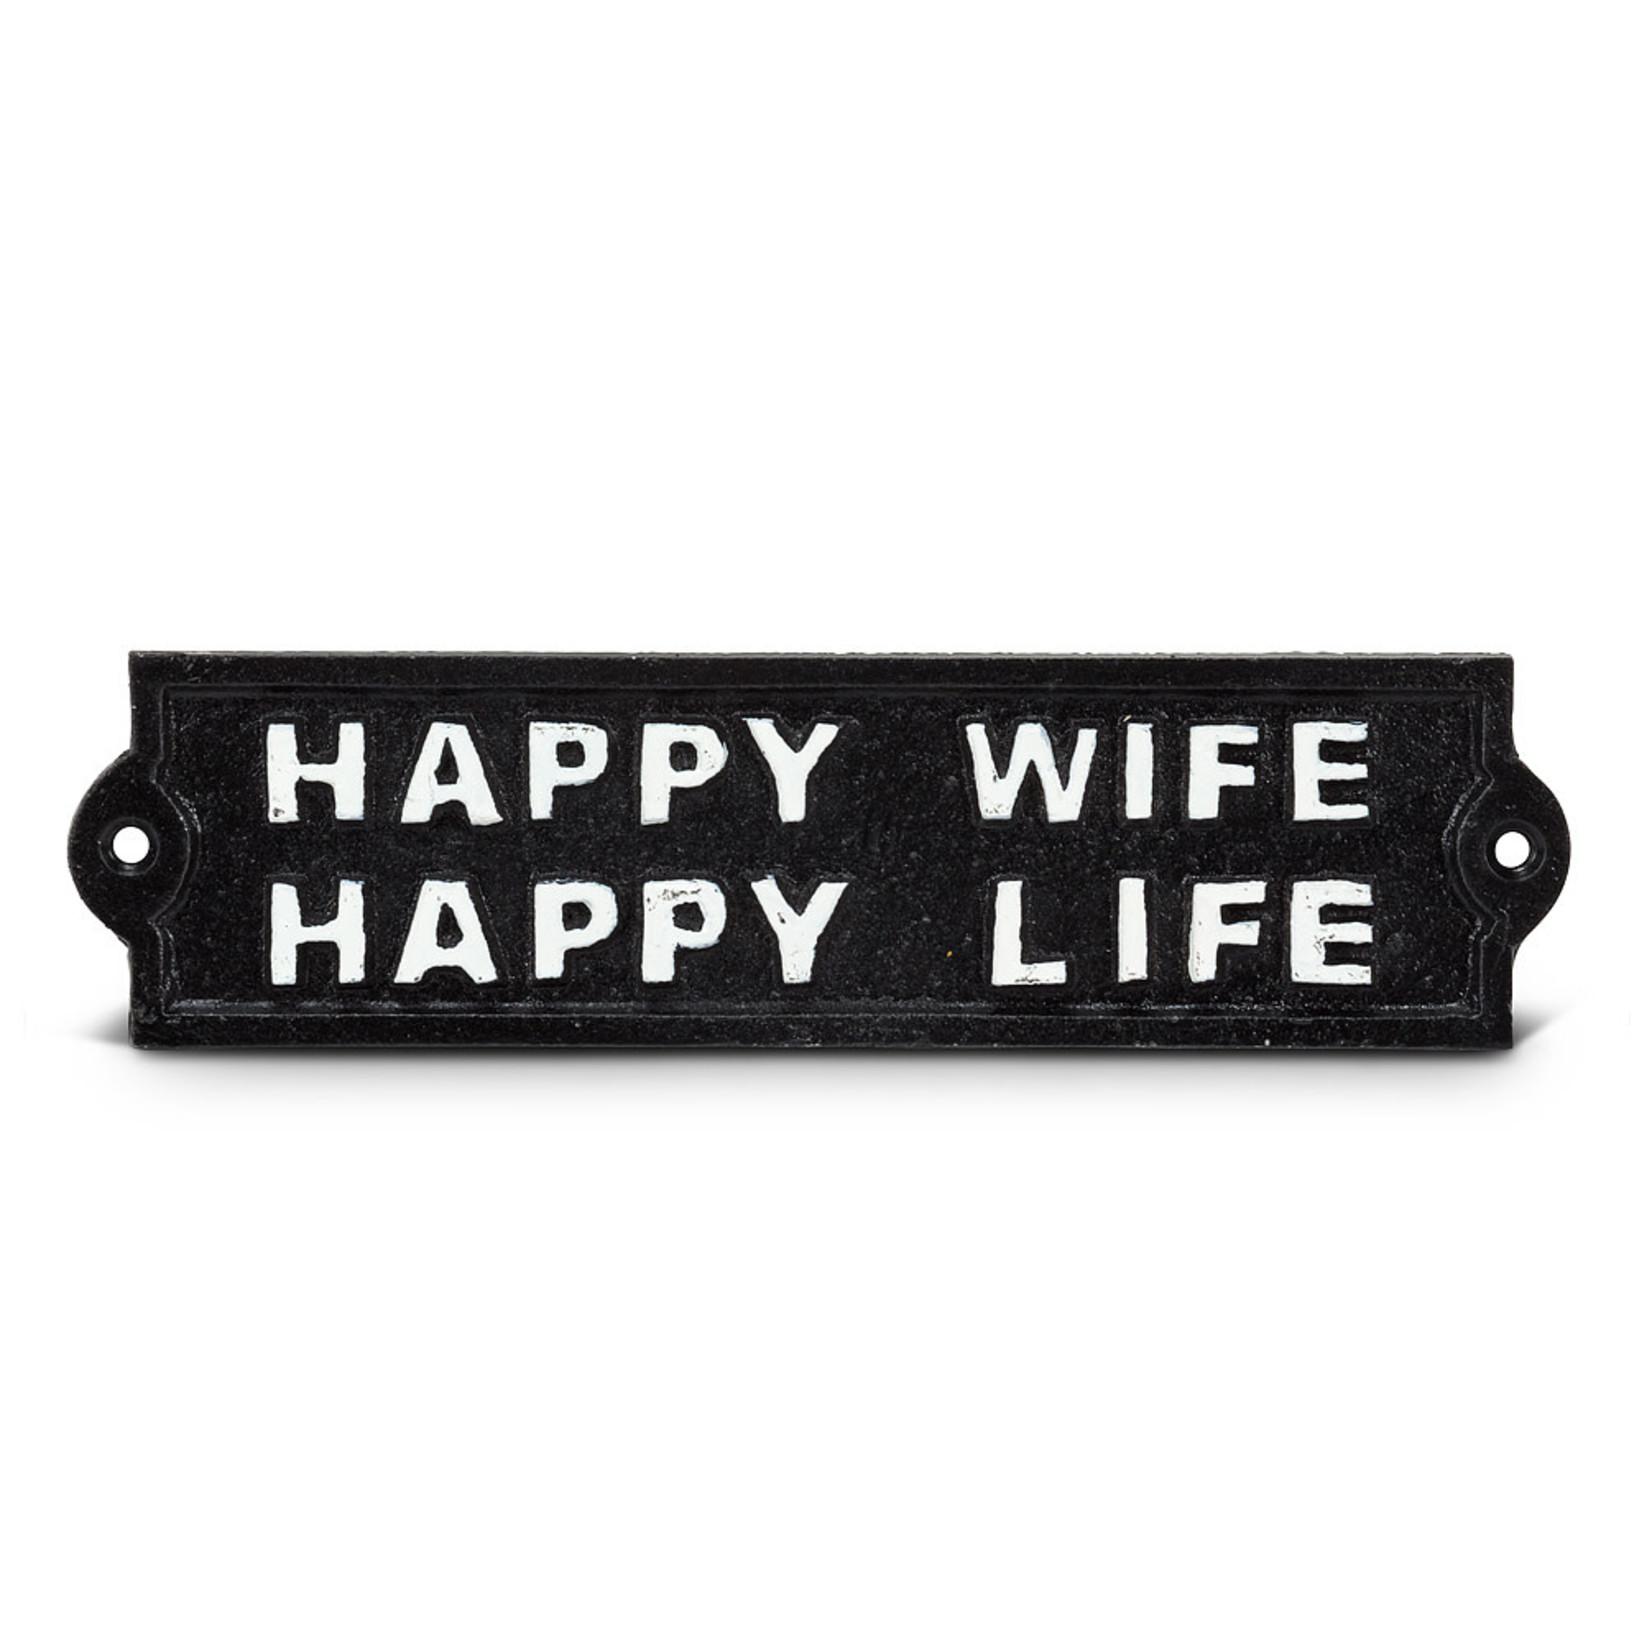 FT Pembroke Happy wife, happy life - cast iron sign